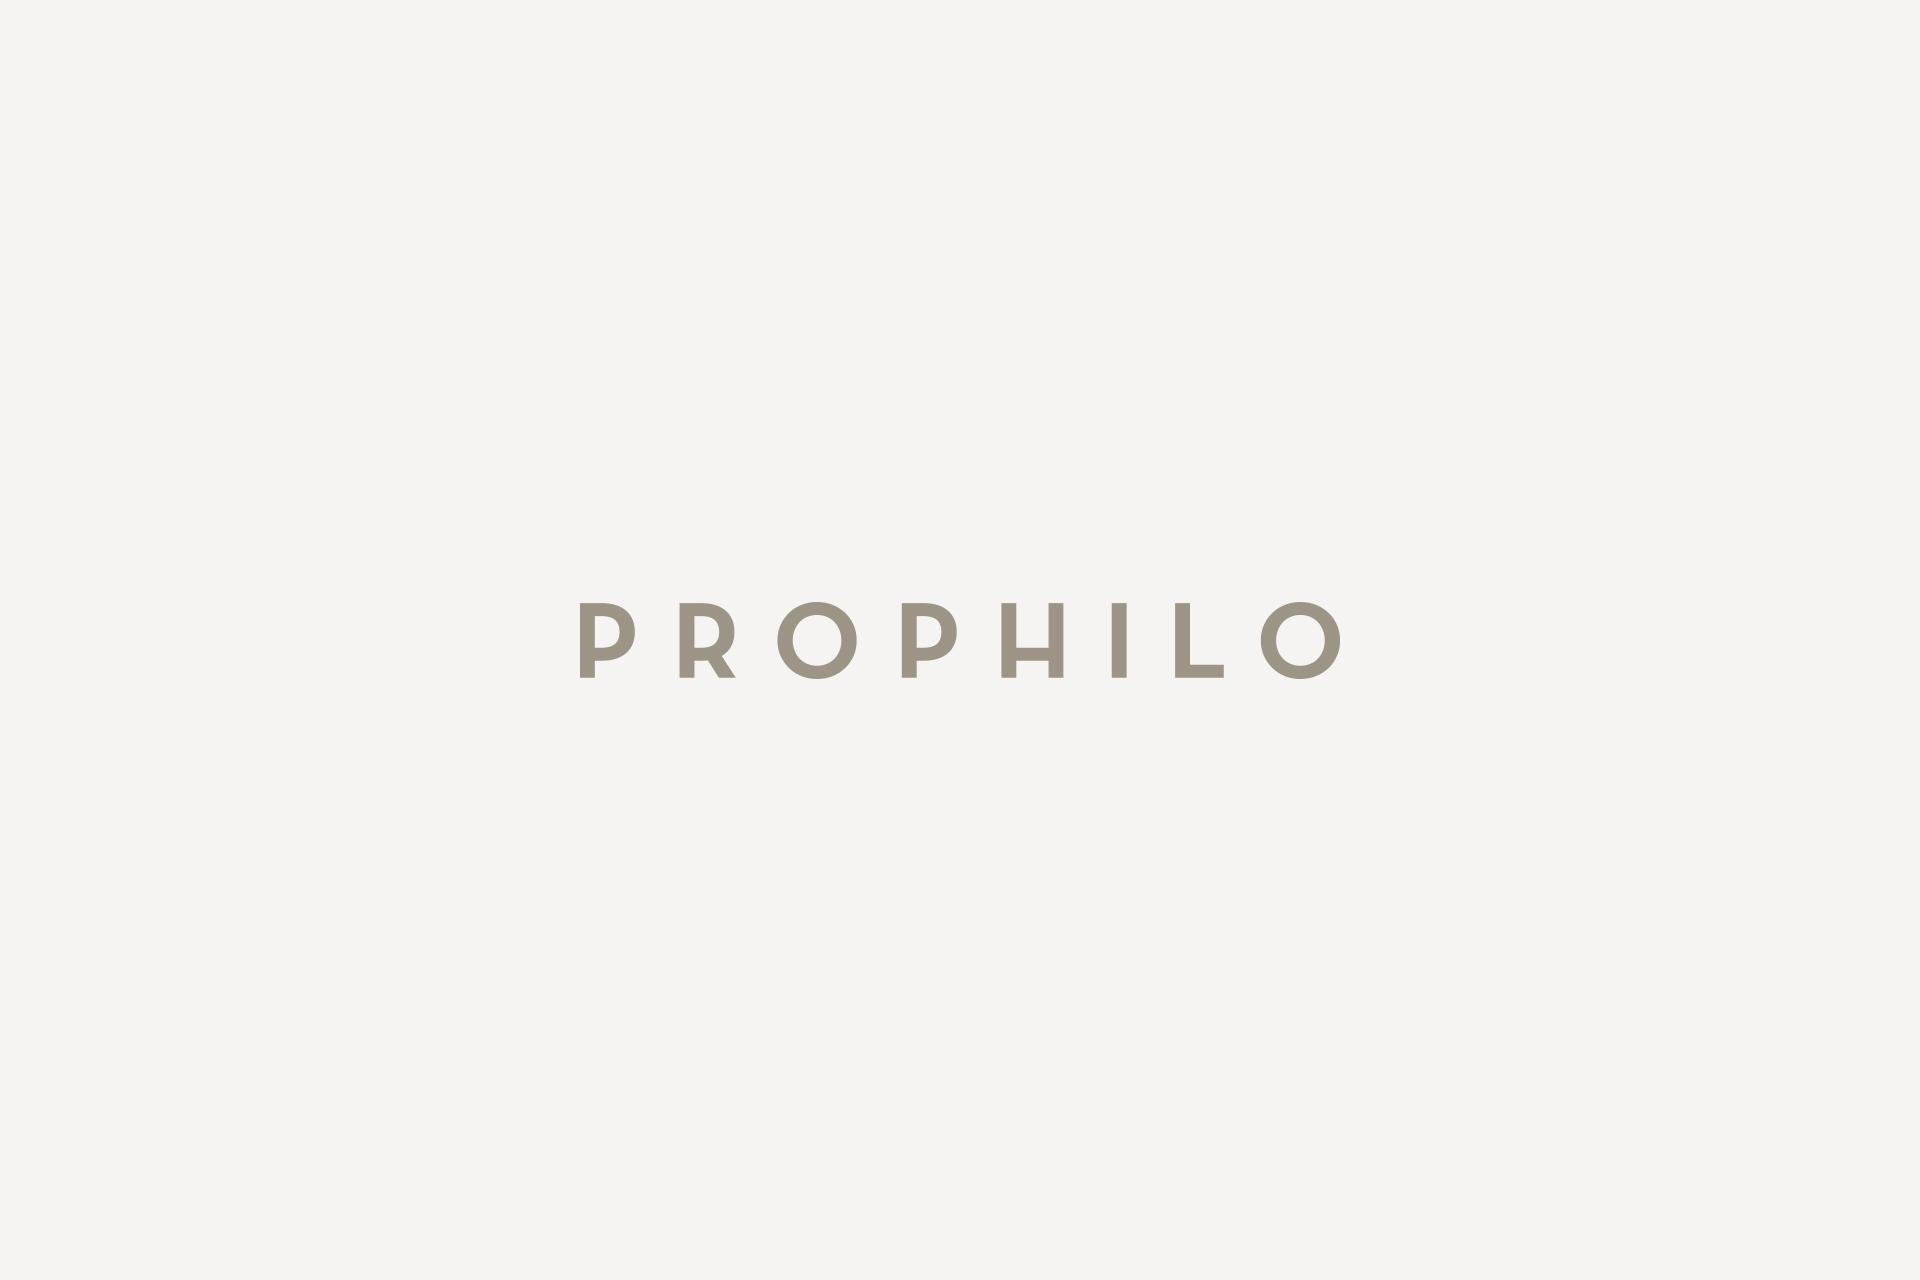 logo phisito_web1